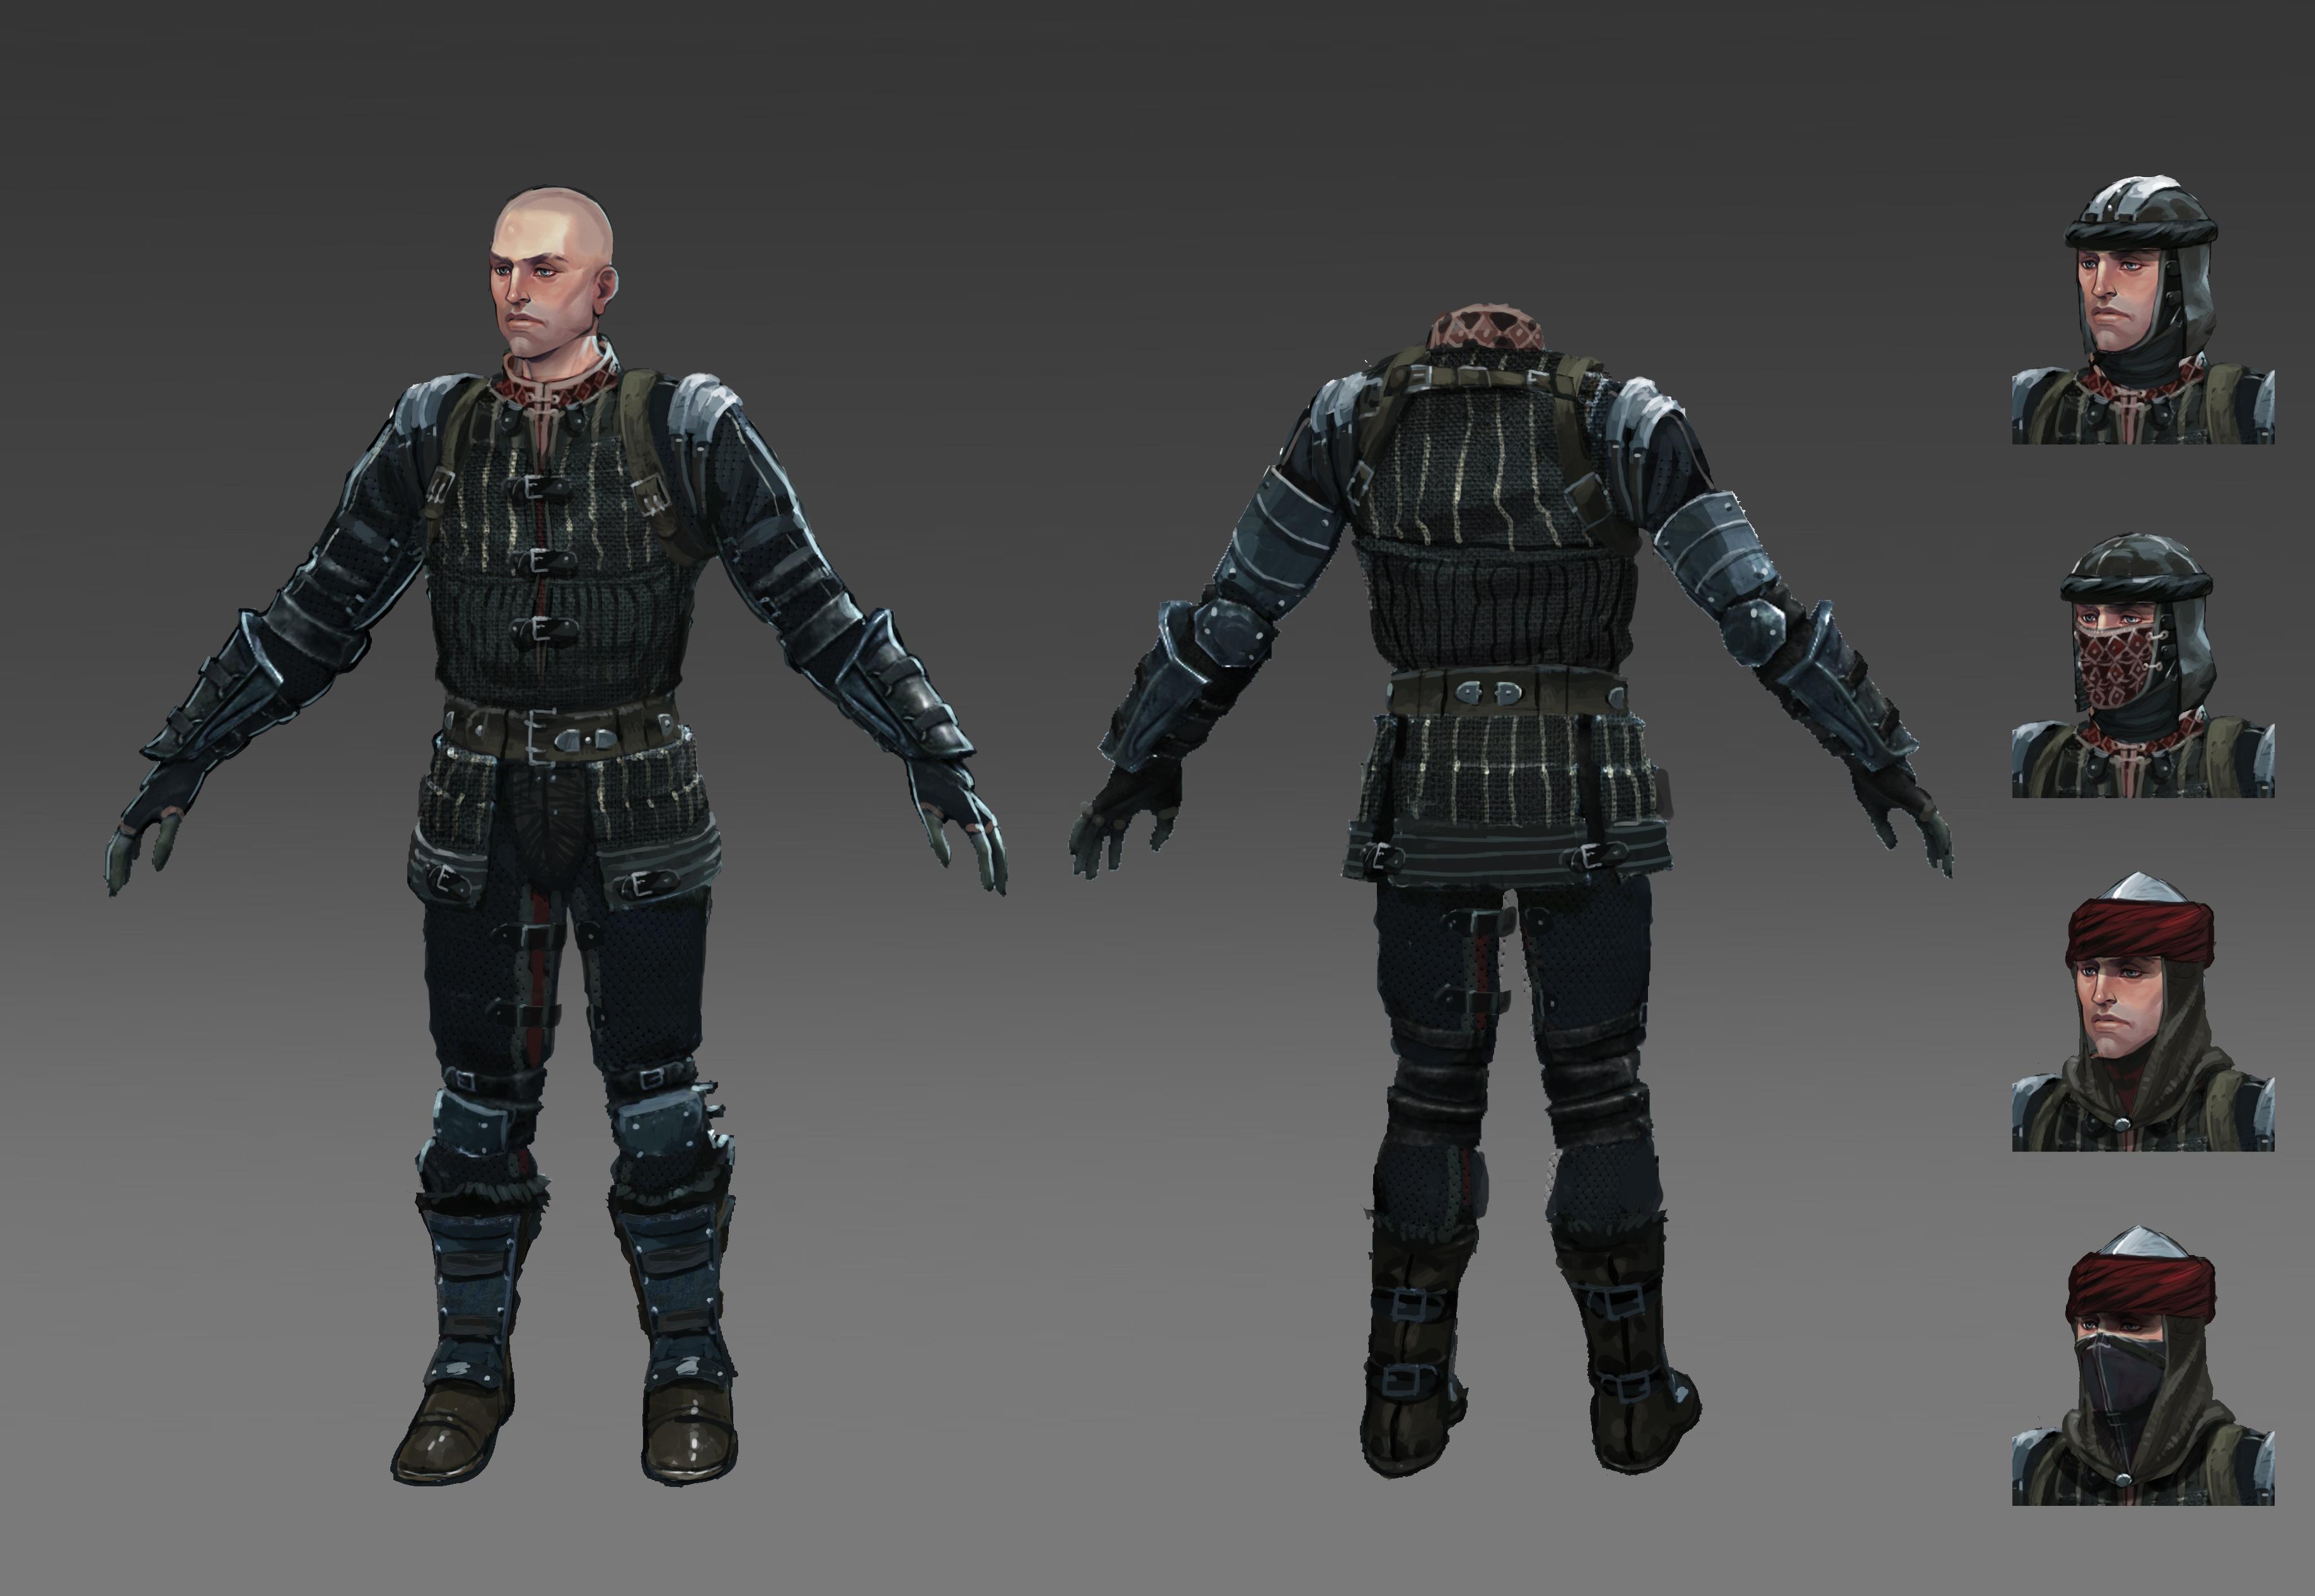 Armored Dragon Art Concept Art For Armor